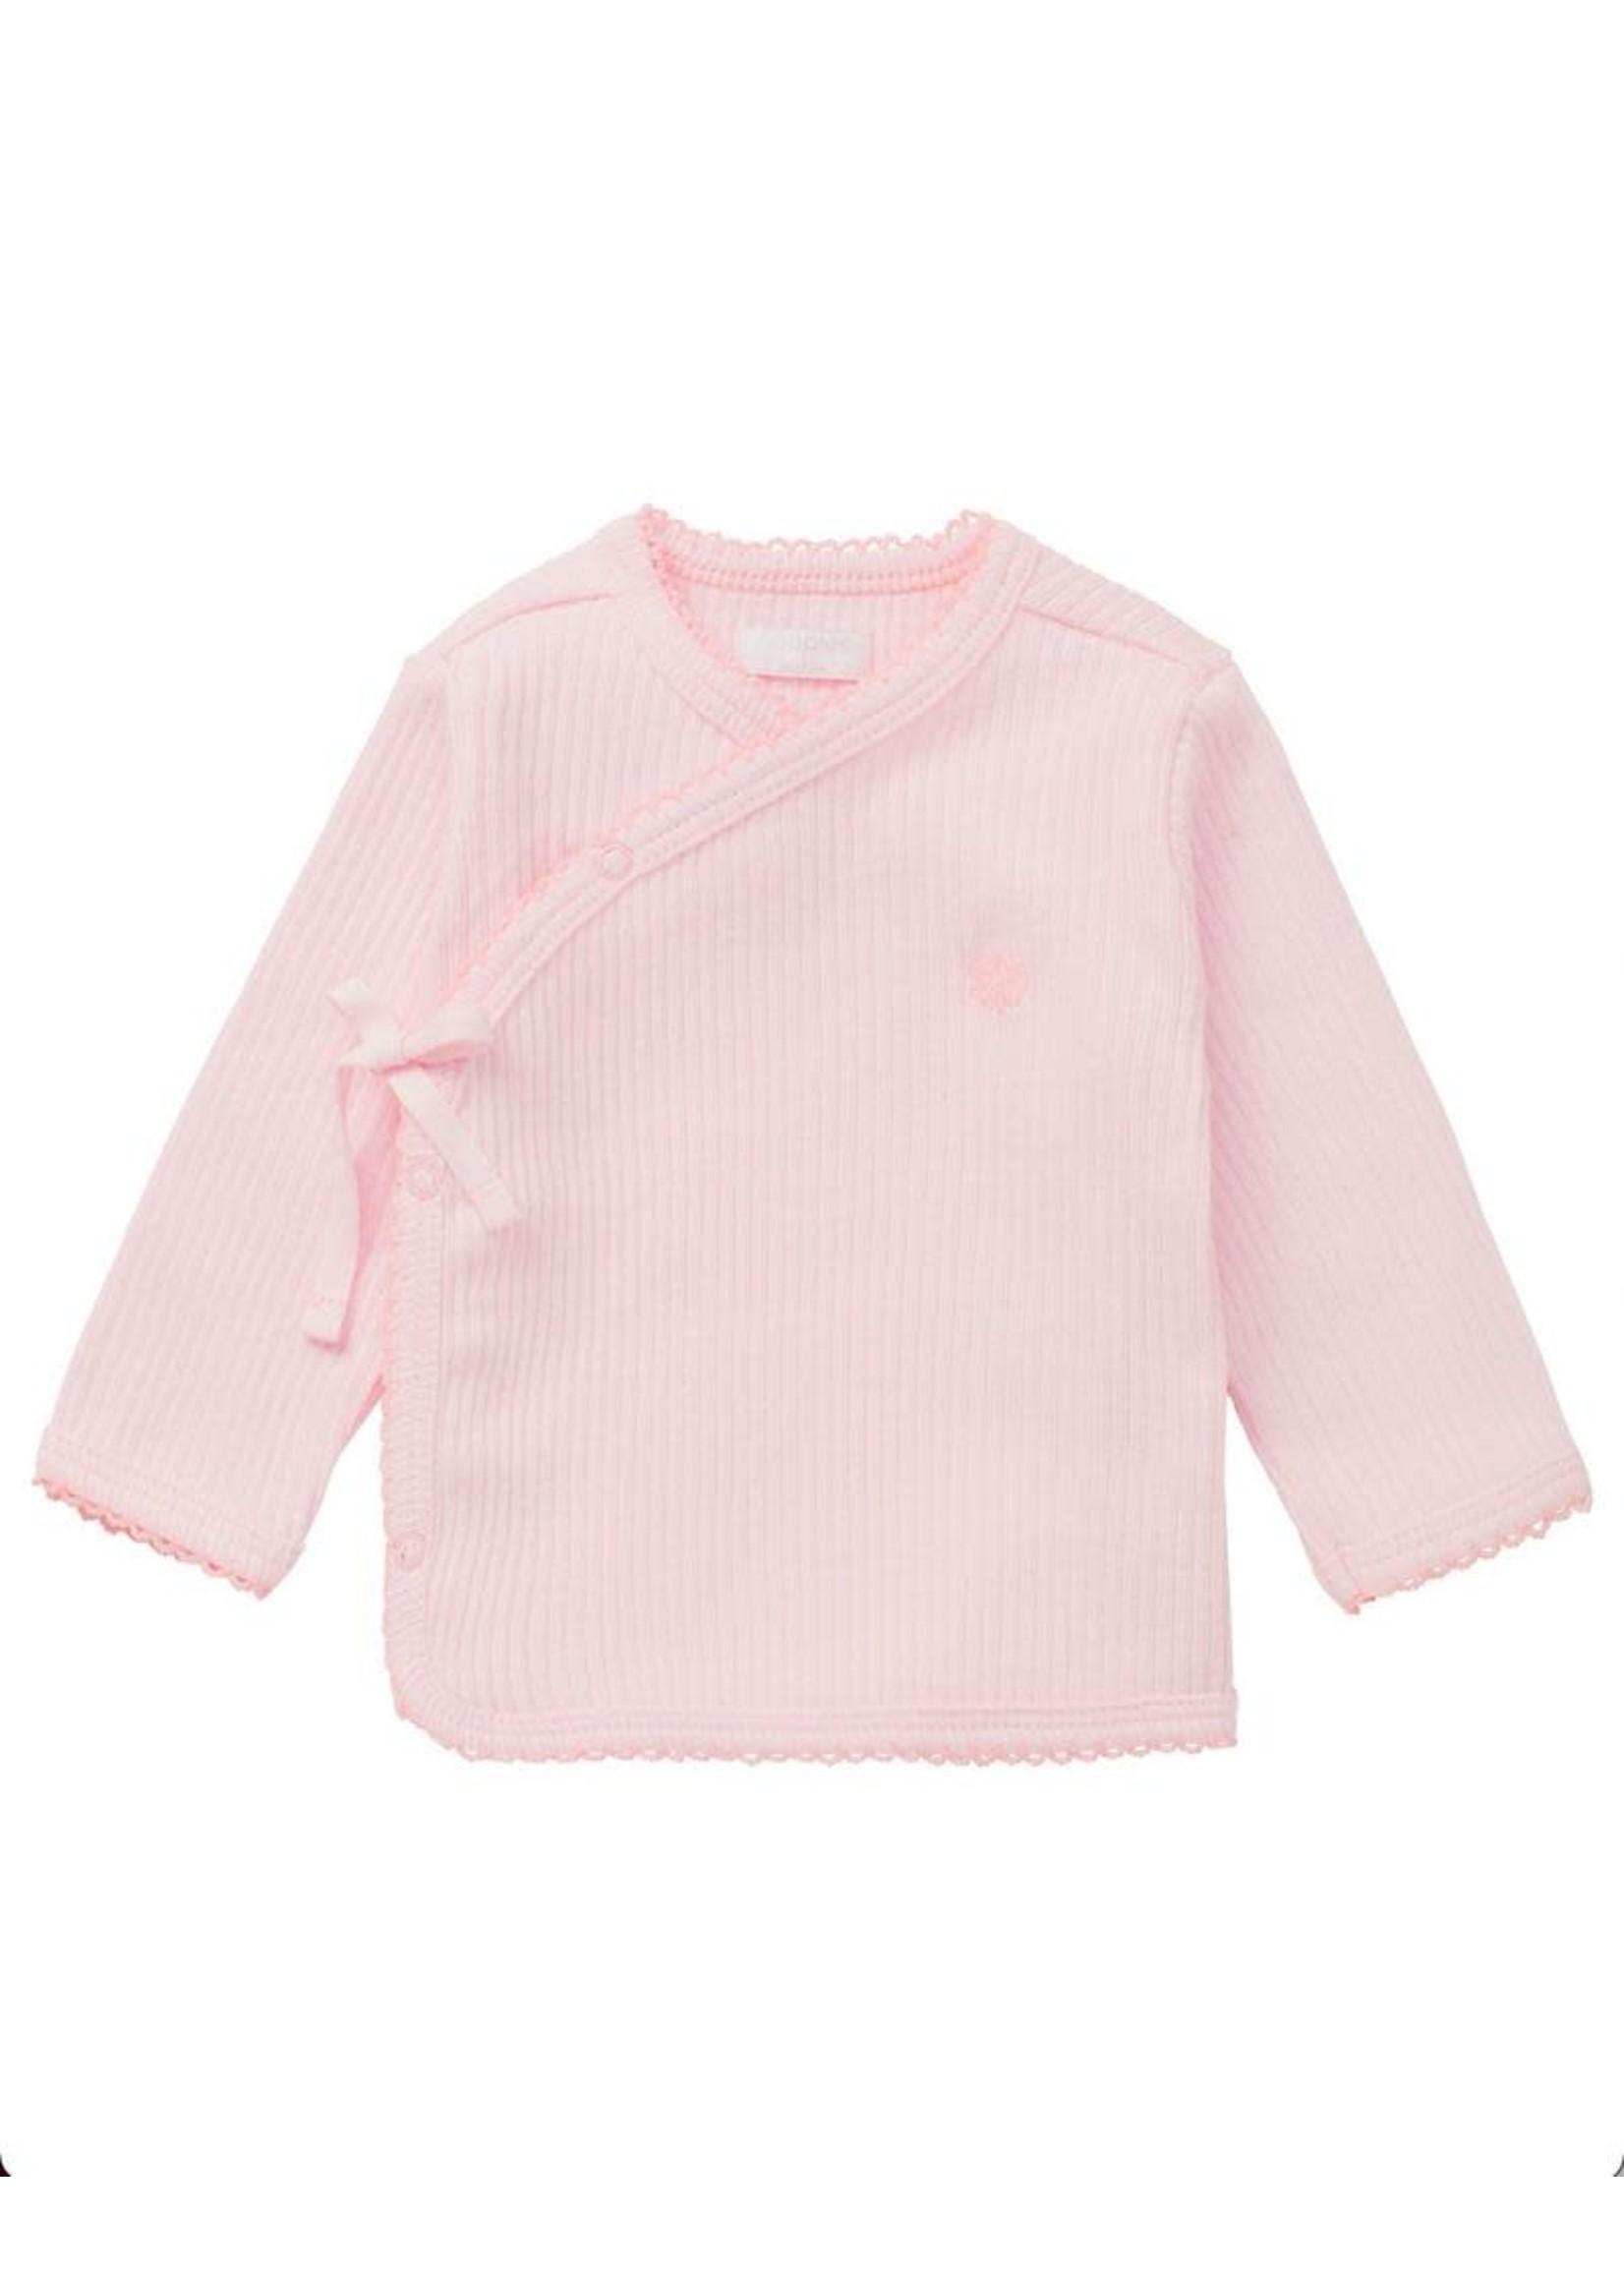 Noppies Kids Noppies Kids, Meadow Lake Primrose Pink Long Sleeve Shirt